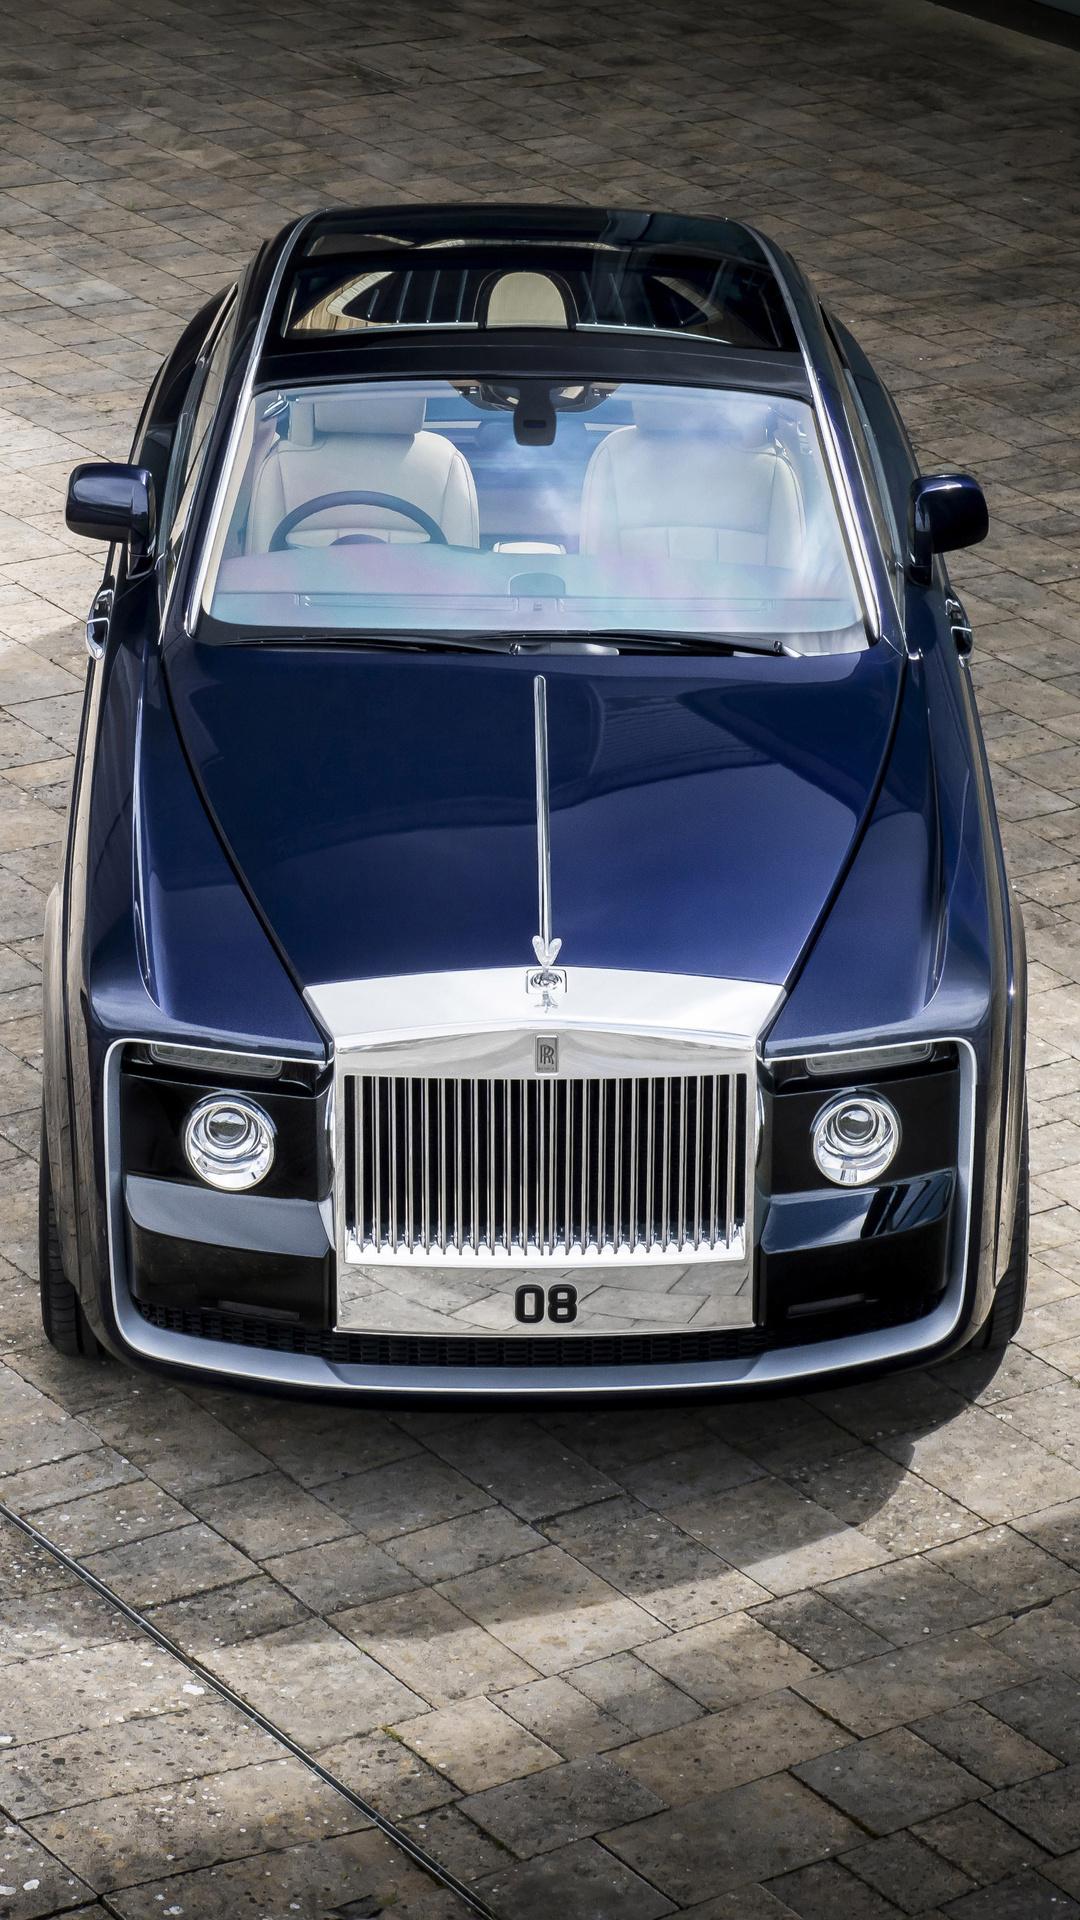 1080x1920 Rolls Royce Sweptail Iphone 7,6s,6 Plus, Pixel ...